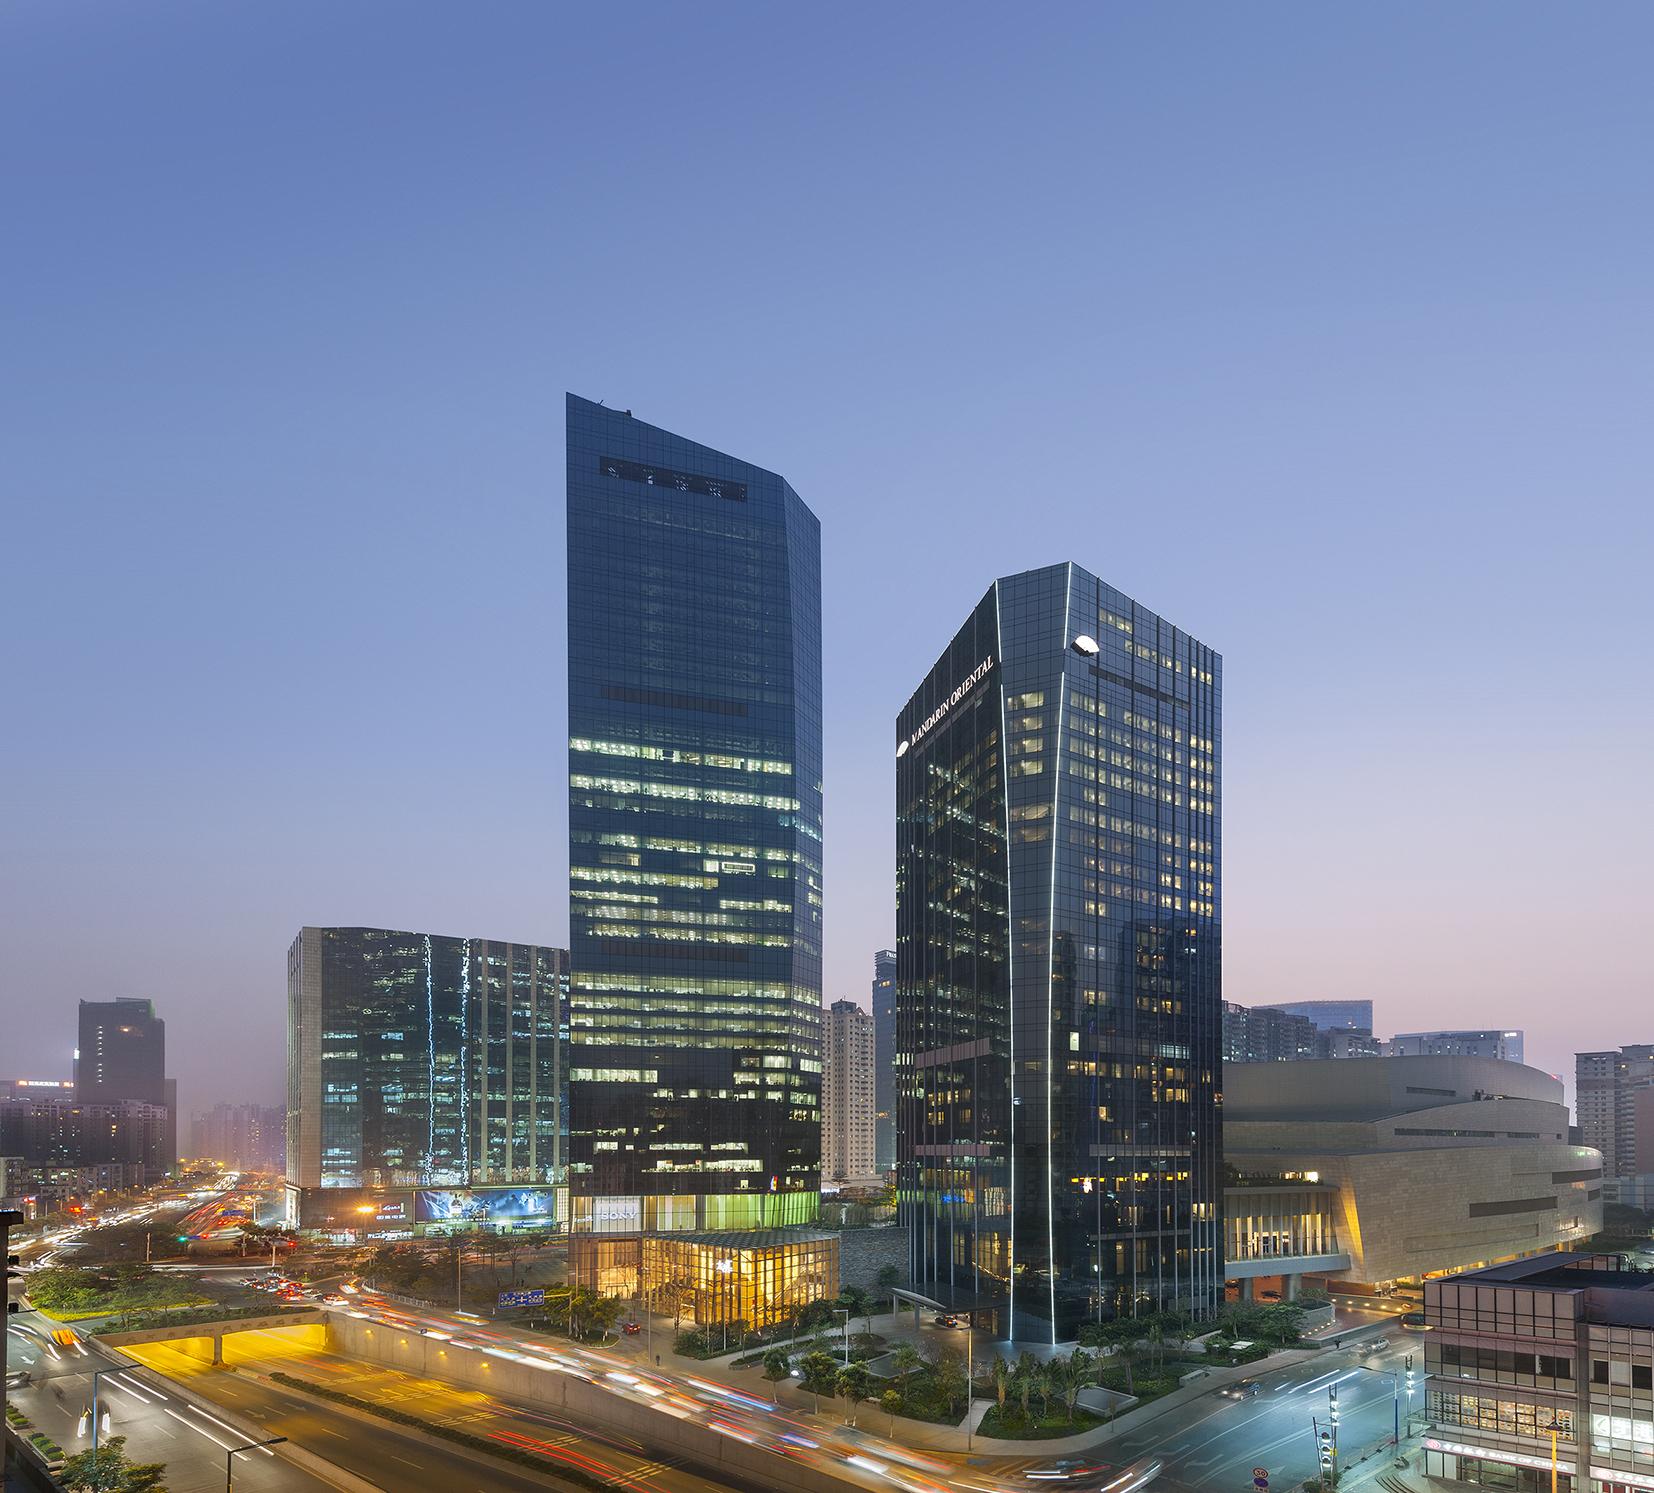 Mandarin Oriental Guangzhou at dusk.